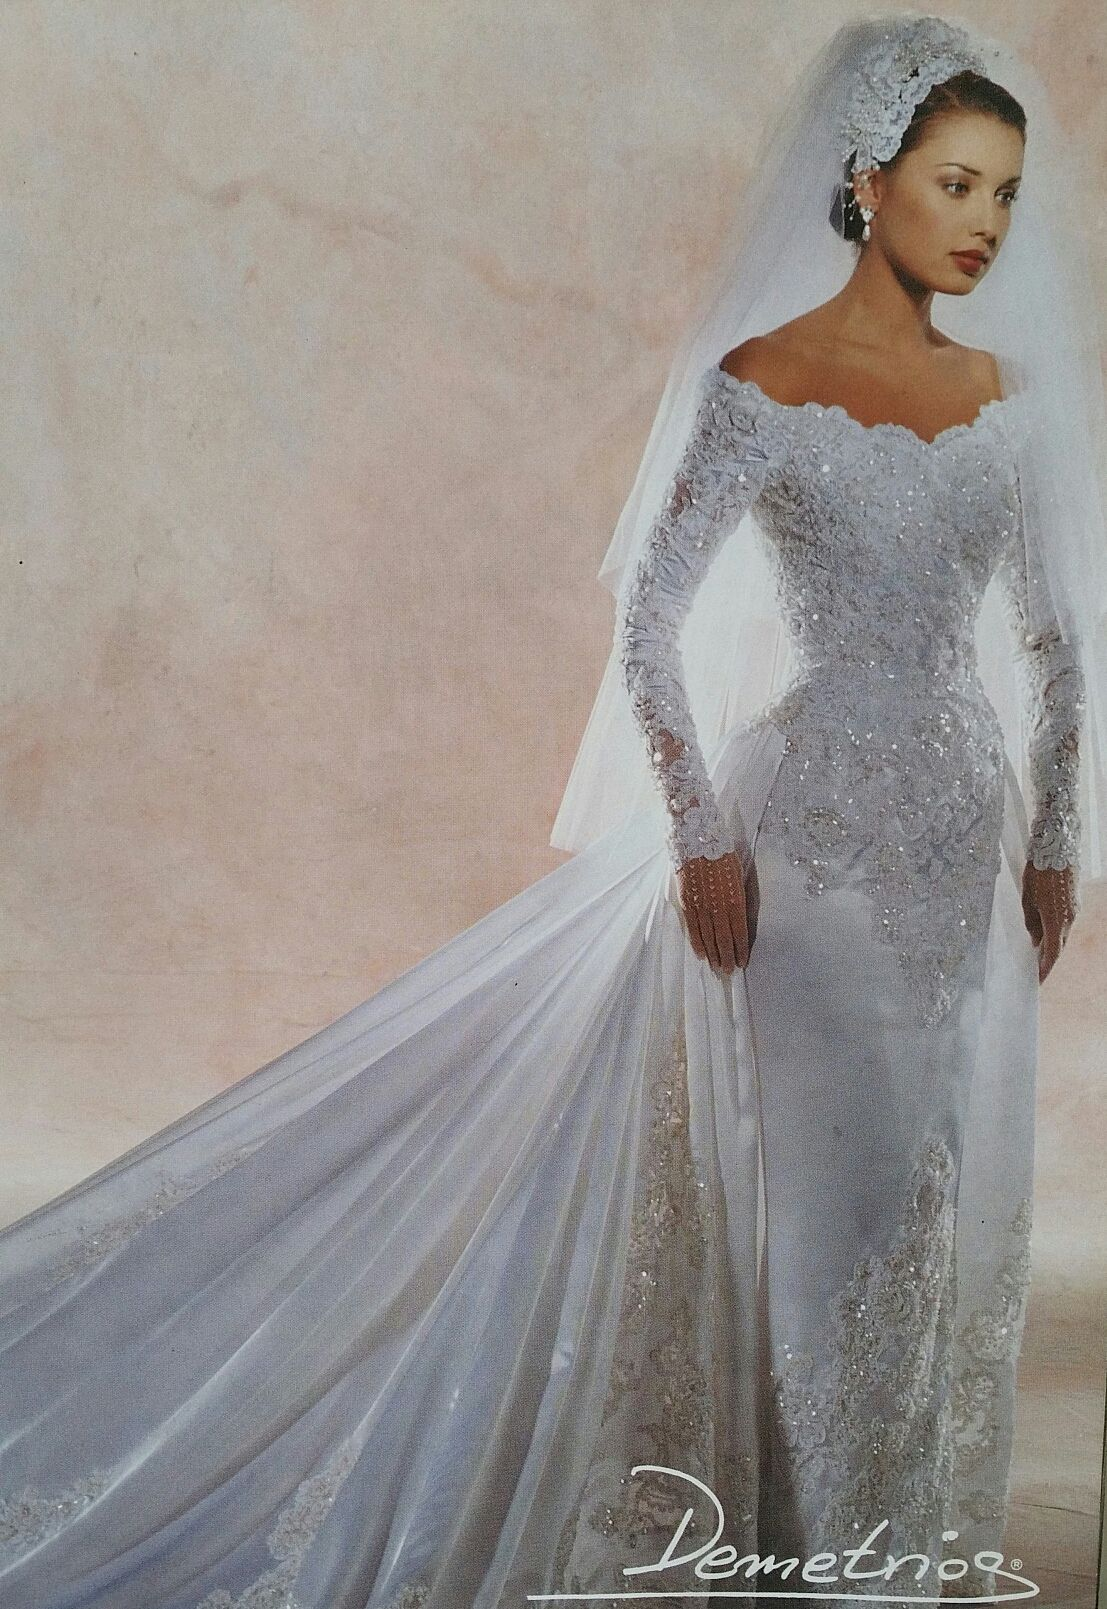 Demetrios 20   Bridal dresses vintage, Wedding dresses, 20s ...